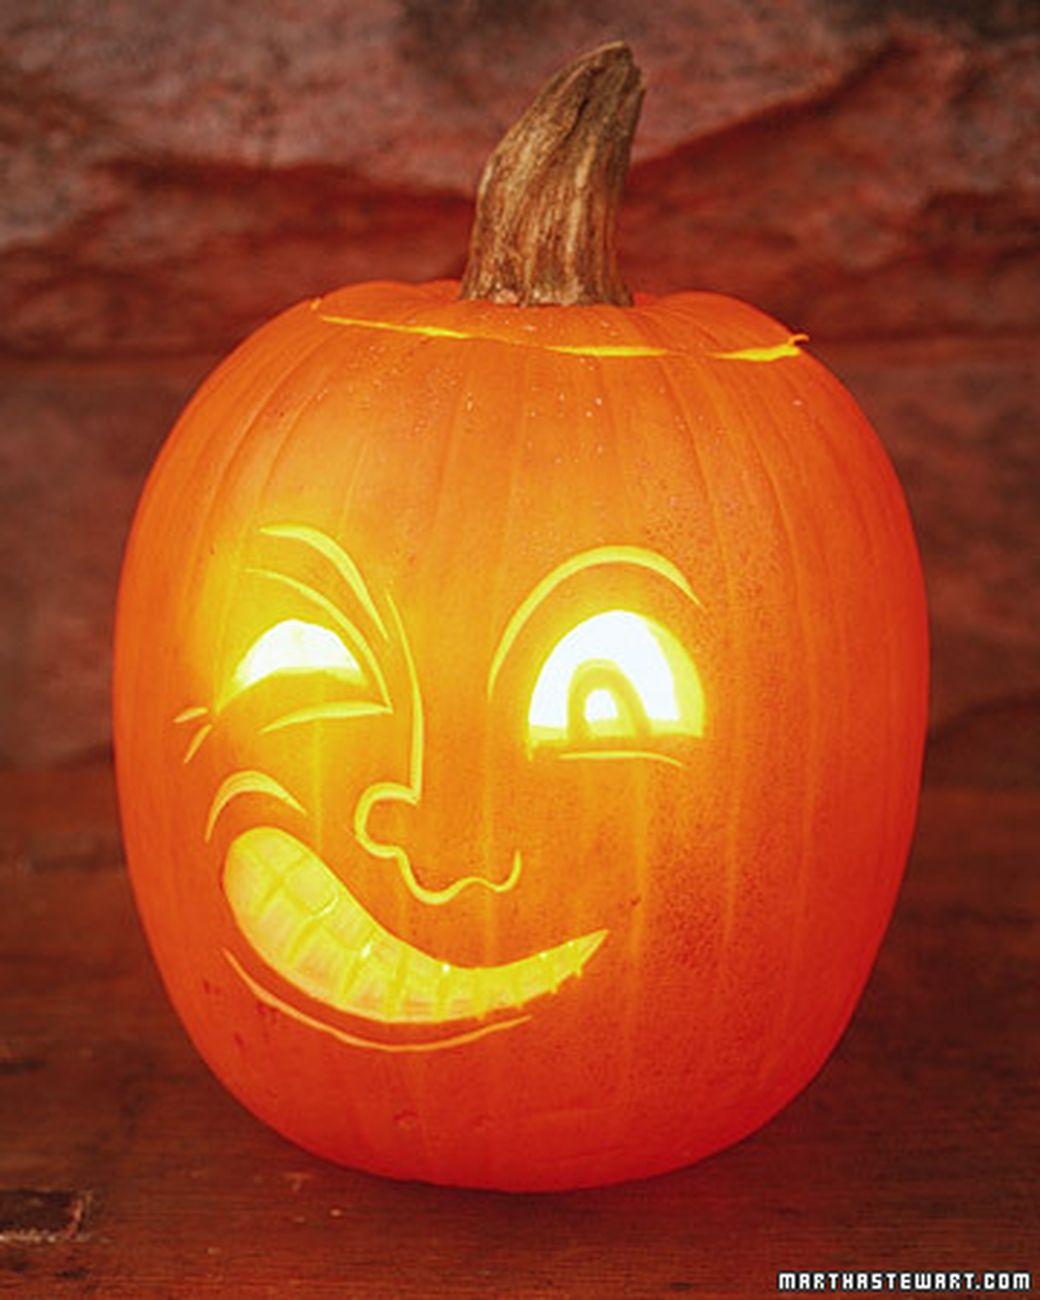 Explore Halloween Pumpkin Carvings and more Jack